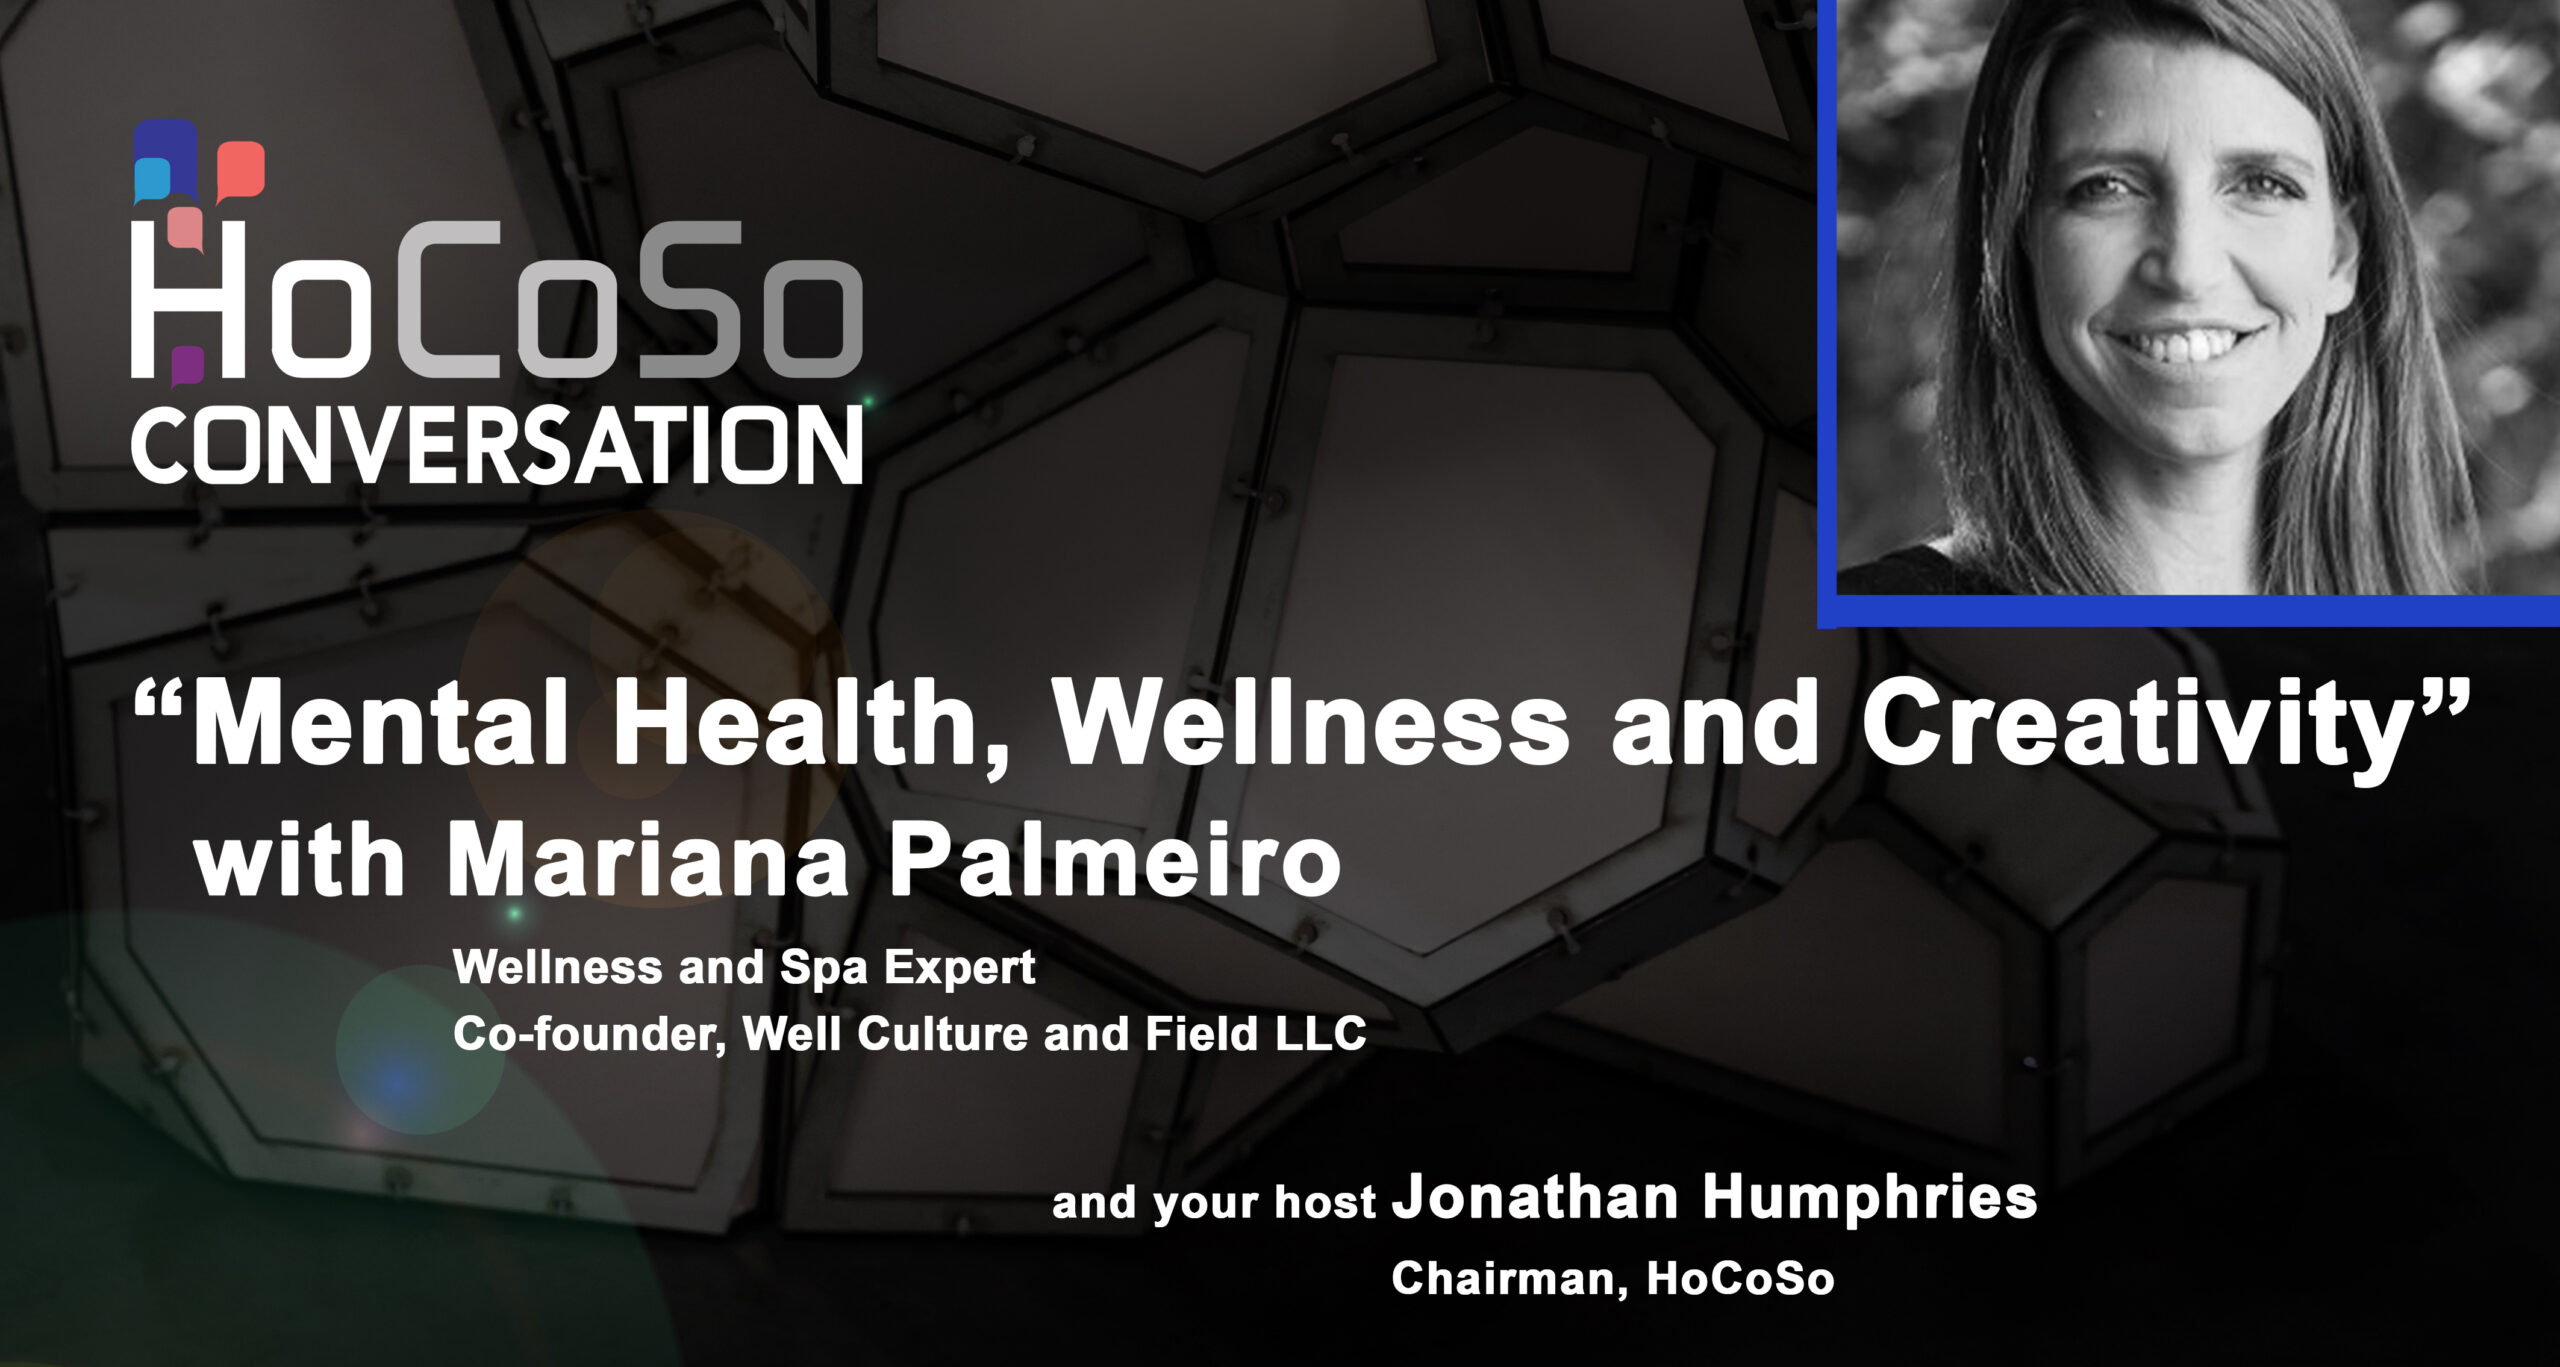 "HoCoSo CONVERSATION - ""Mental Health, Wellness and Creativity"" with Mariana Palmeiro"